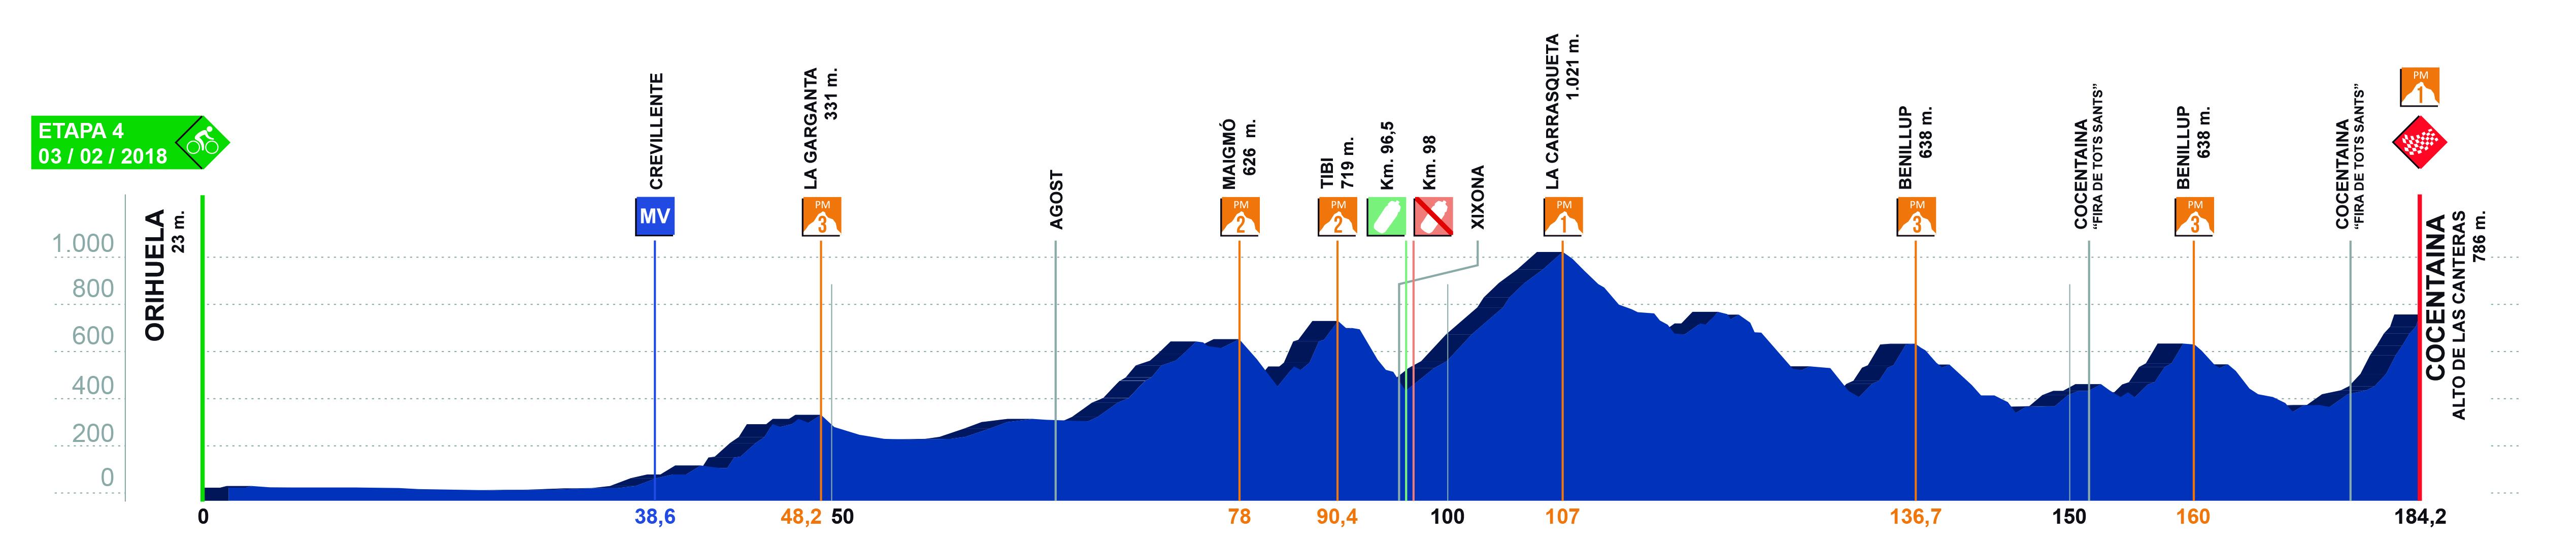 Volta a Valencia 2018 perfil cuarta etapa